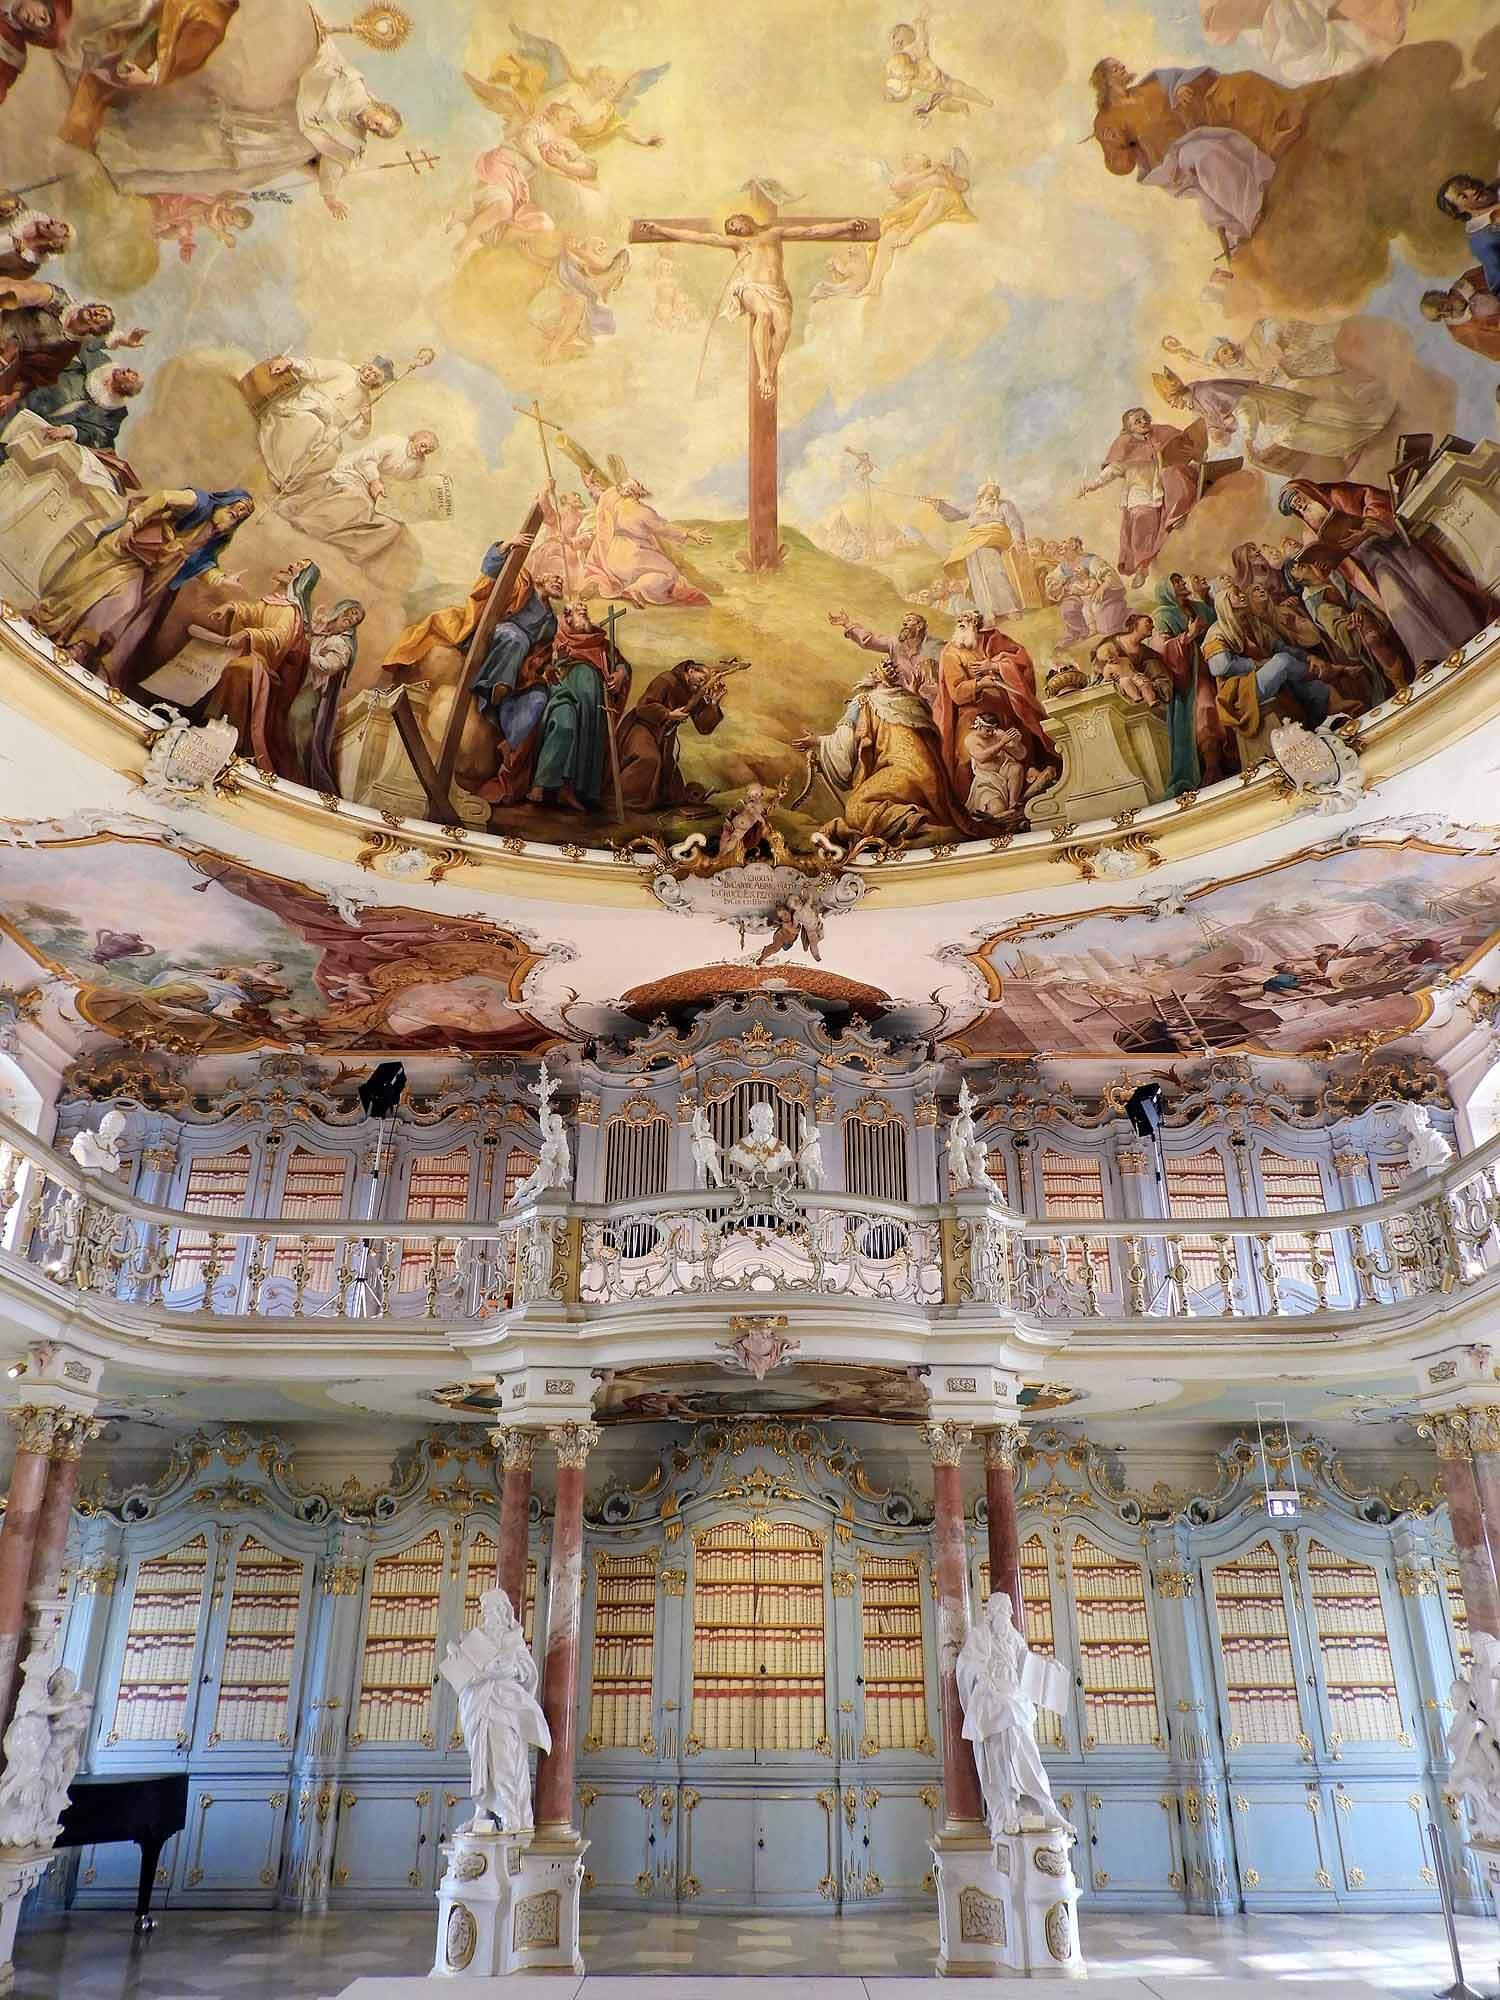 germany-kloster-schussenreid-grand-hall.jpg